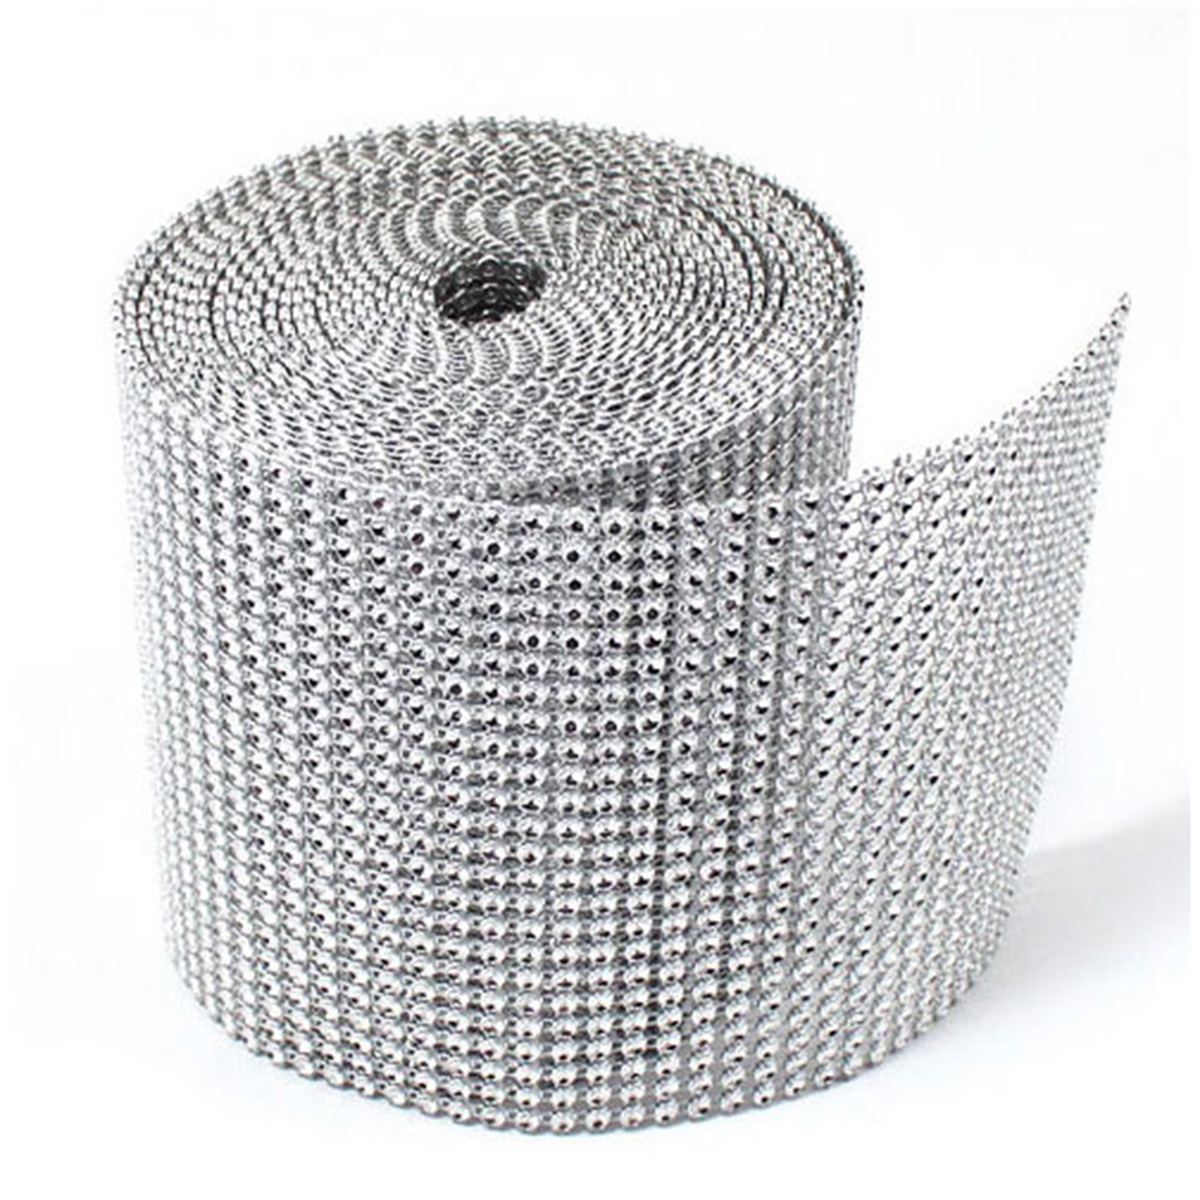 ... Silver Diamond Mesh Wrap Roll Sparkle Rhinestone Crystal Ribbon | eBay